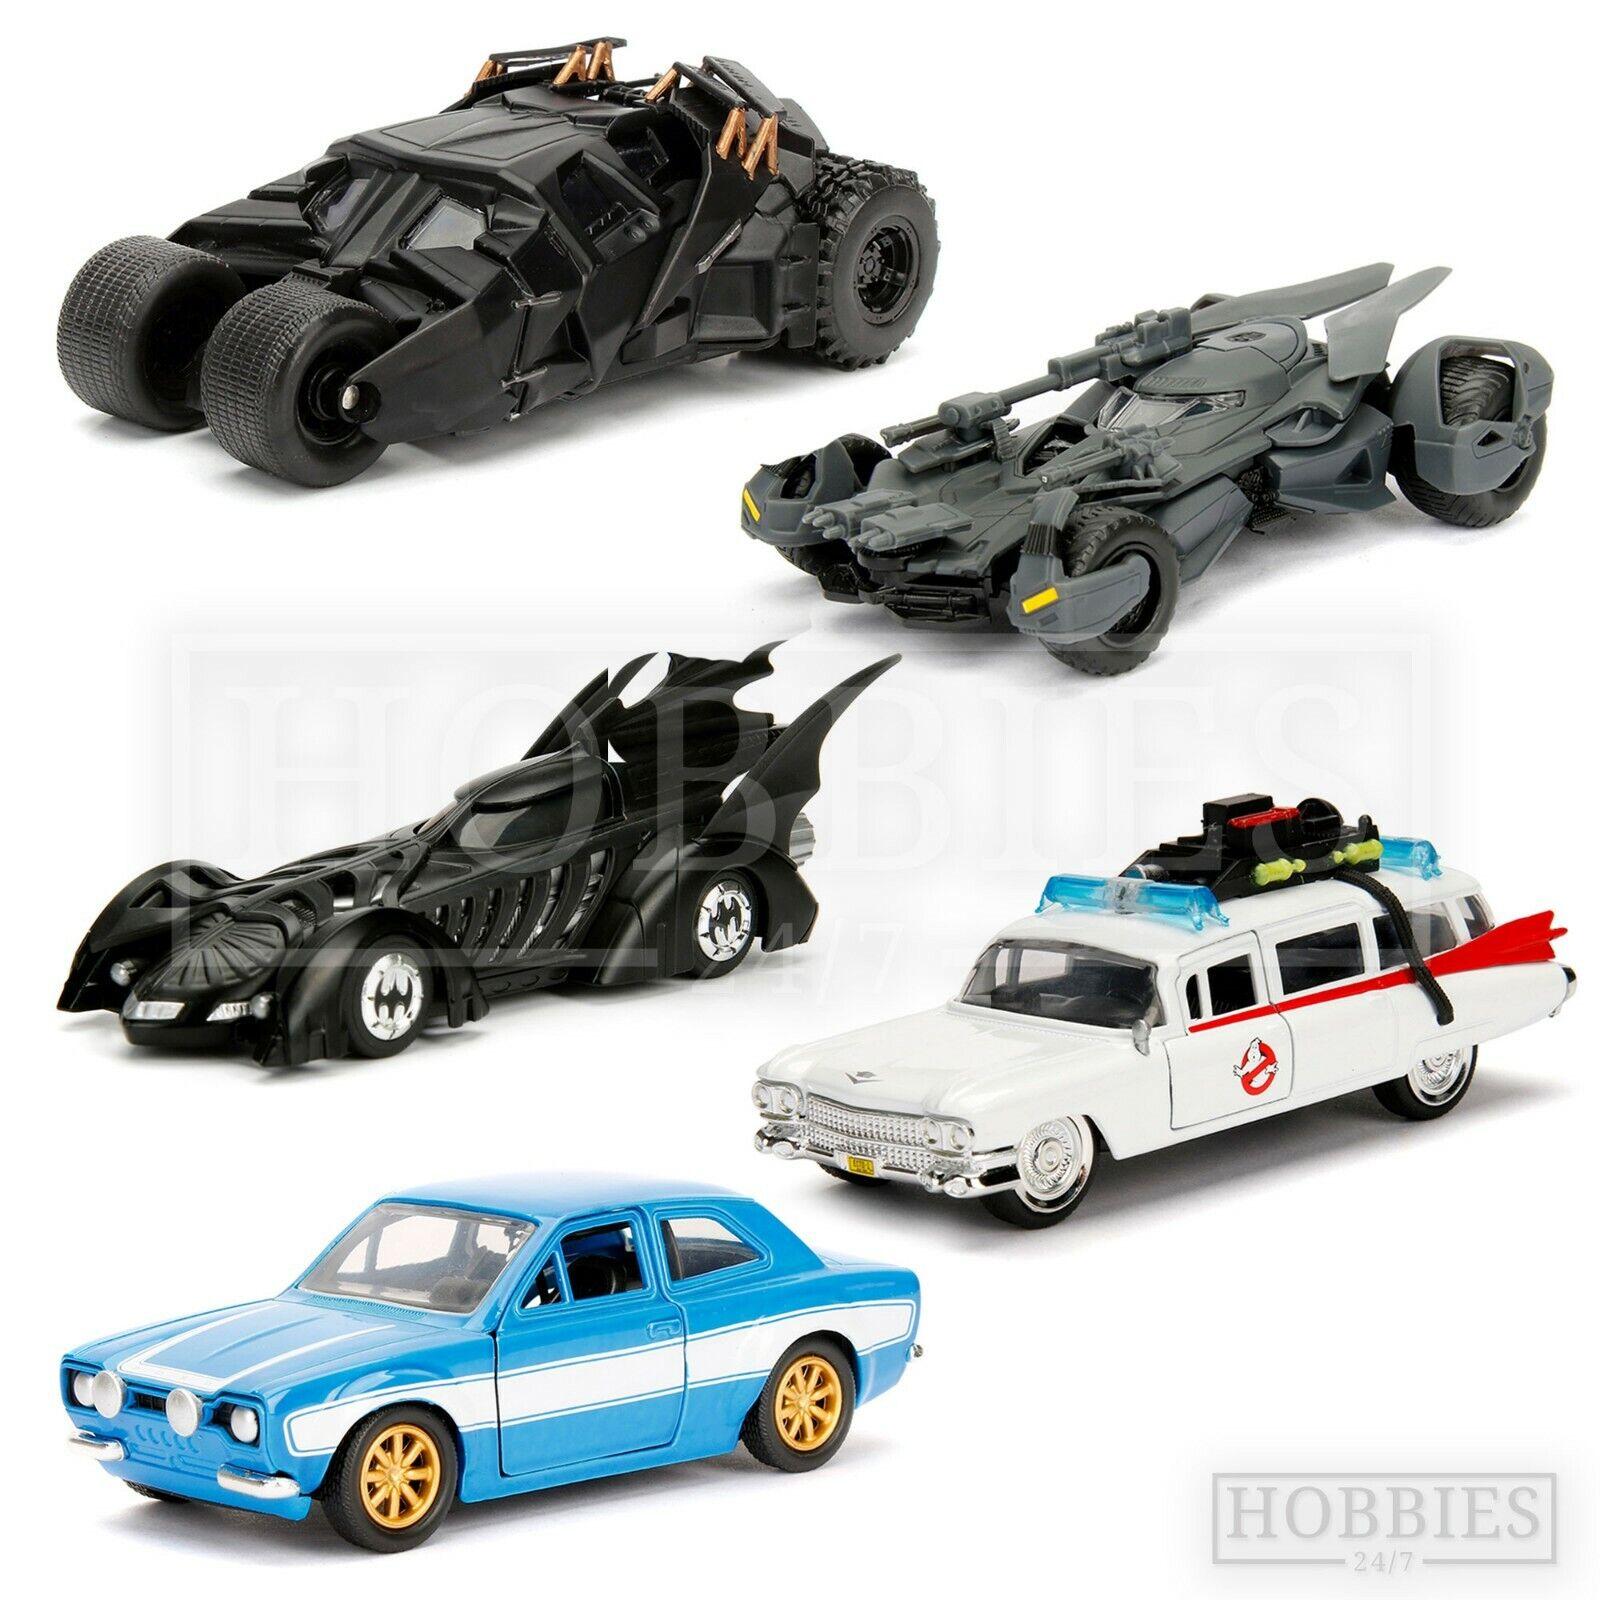 Grey Jada 1:32 Fast /& Furious 7 1976 Chevelle JA97379